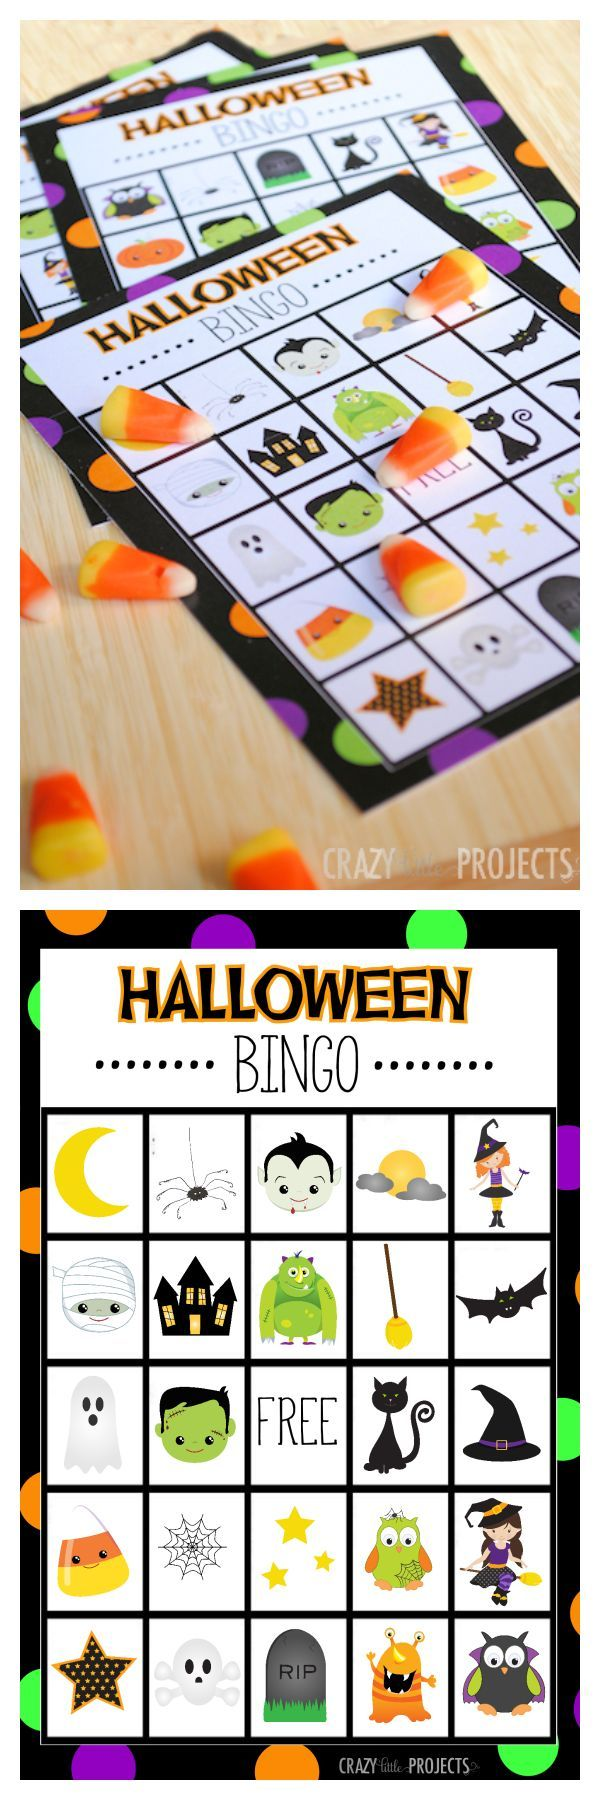 Free Printable Halloween Bingo Game Set-Perfect for kids parties and school…